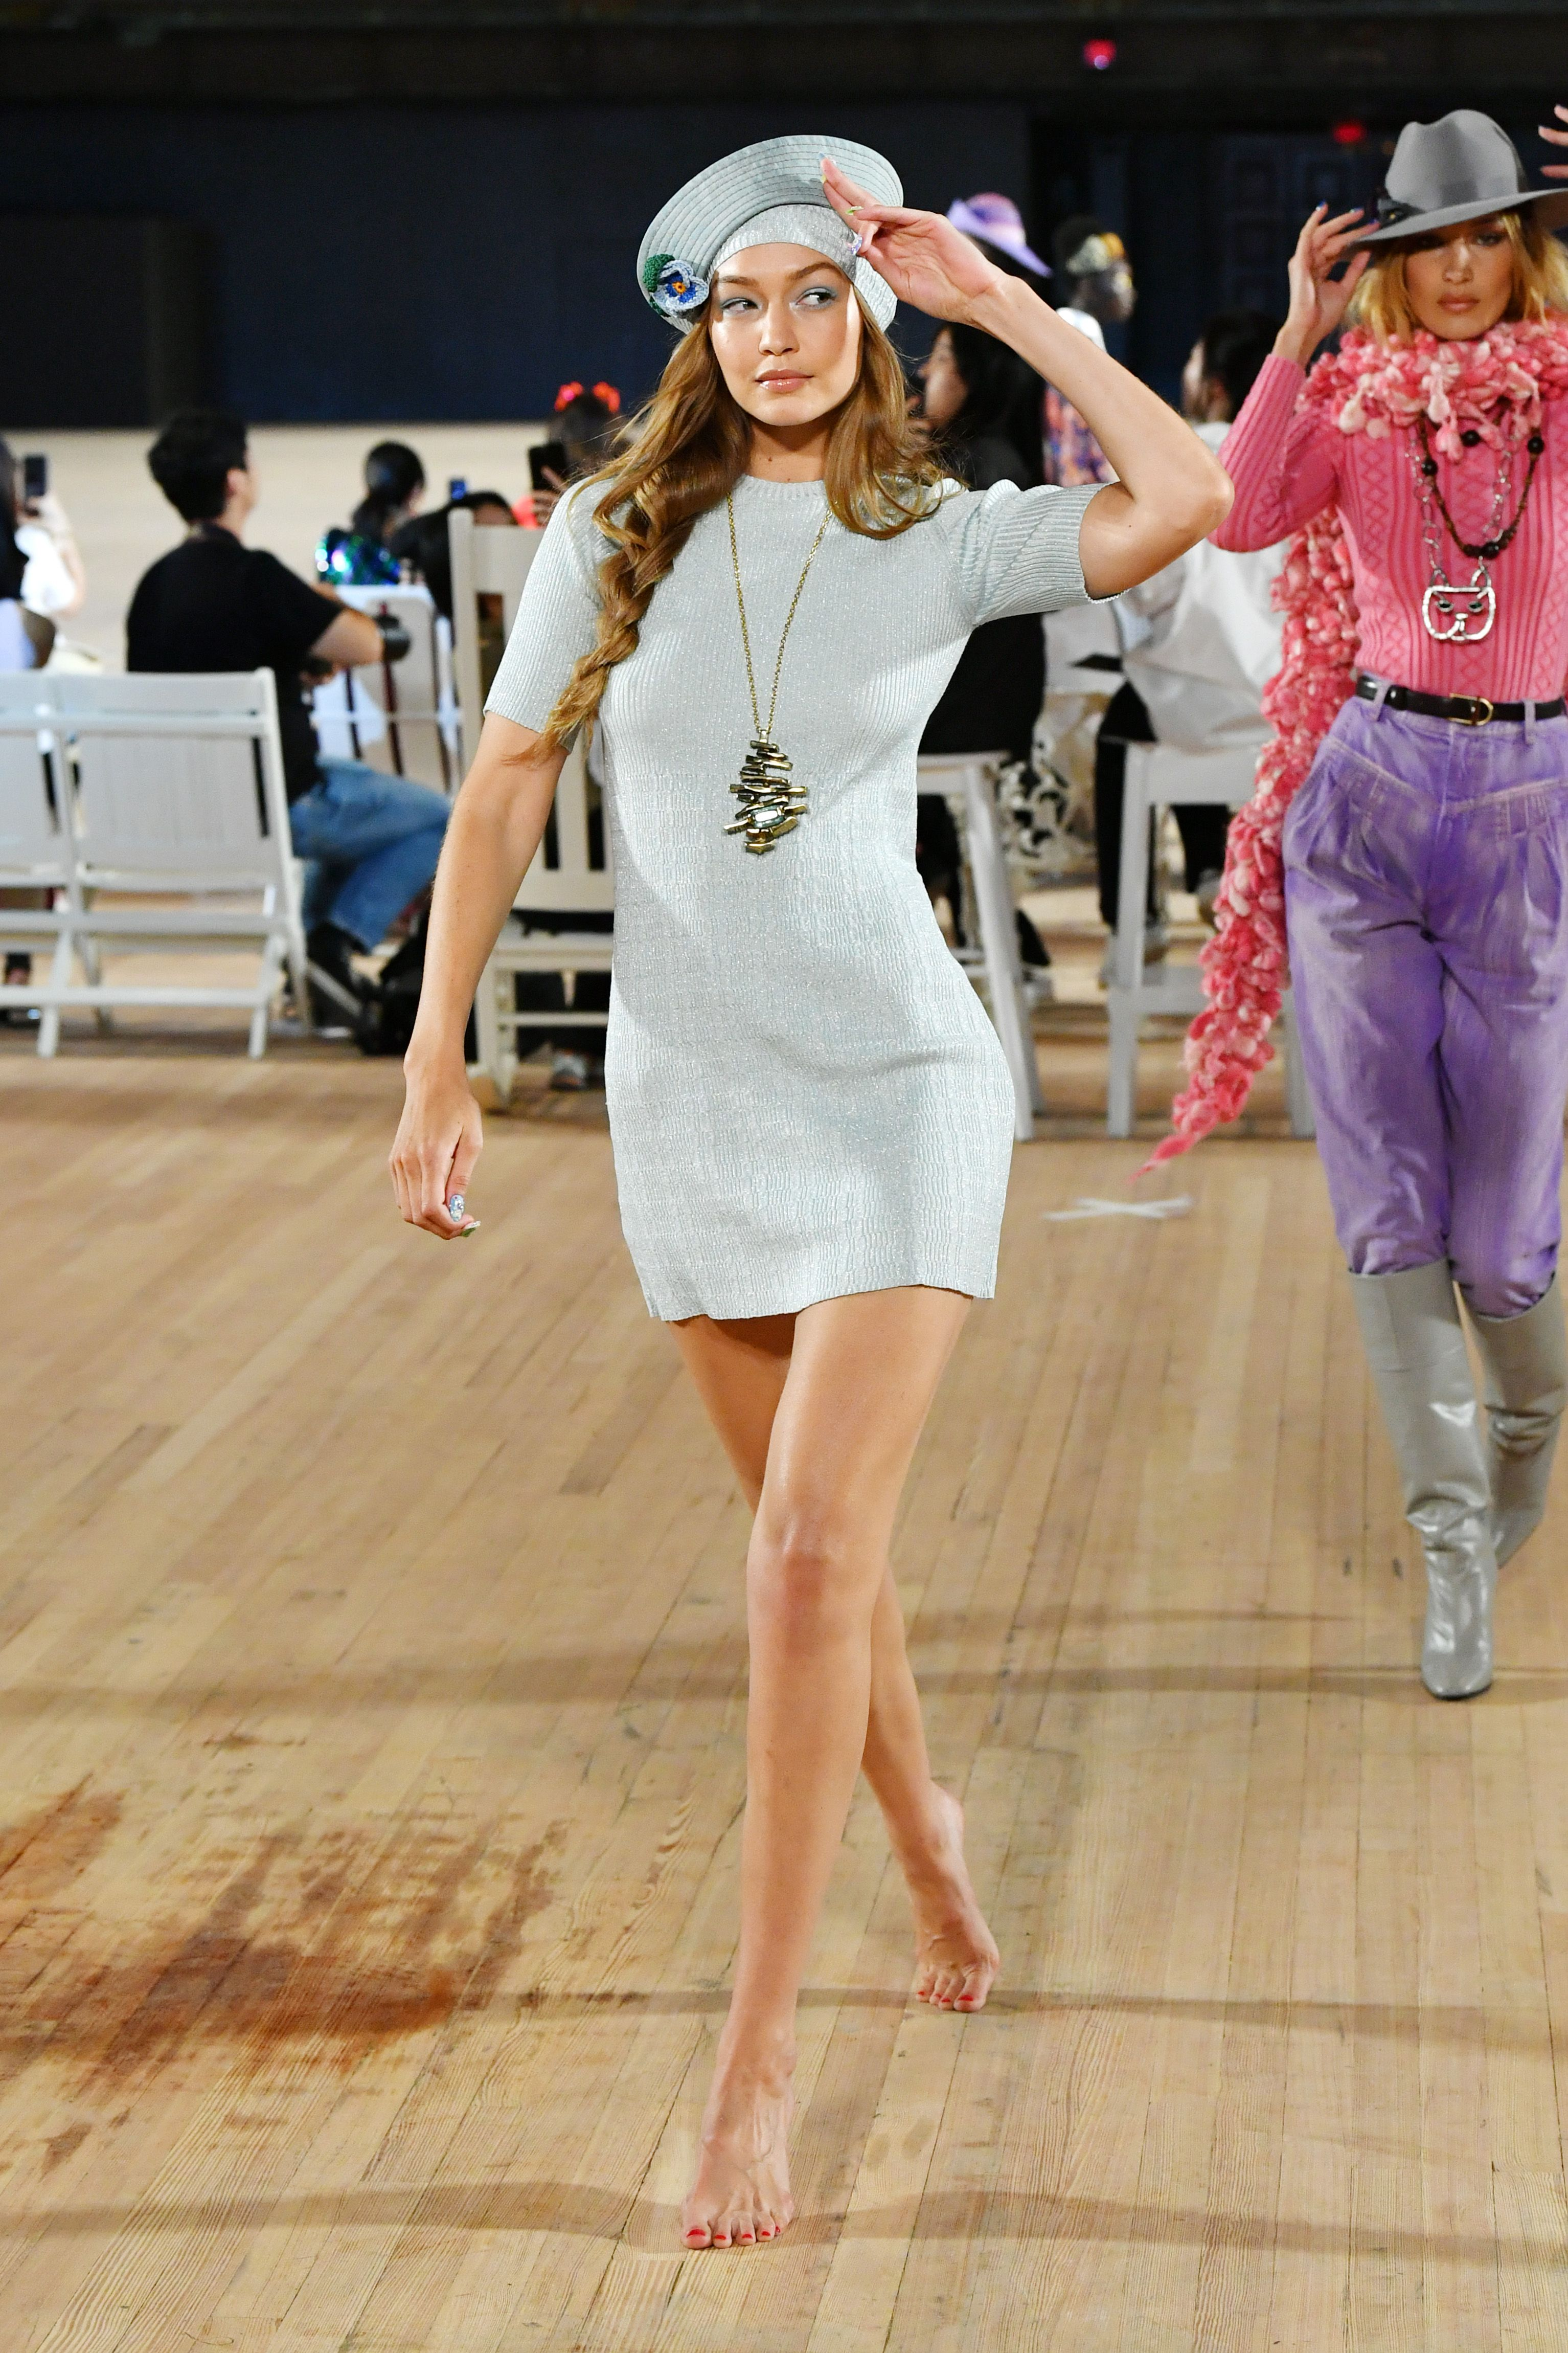 Florence Pugh Barefoot >> Gigi Hadid Walks Barefoot For Marc Jacobs New York Fashion Week